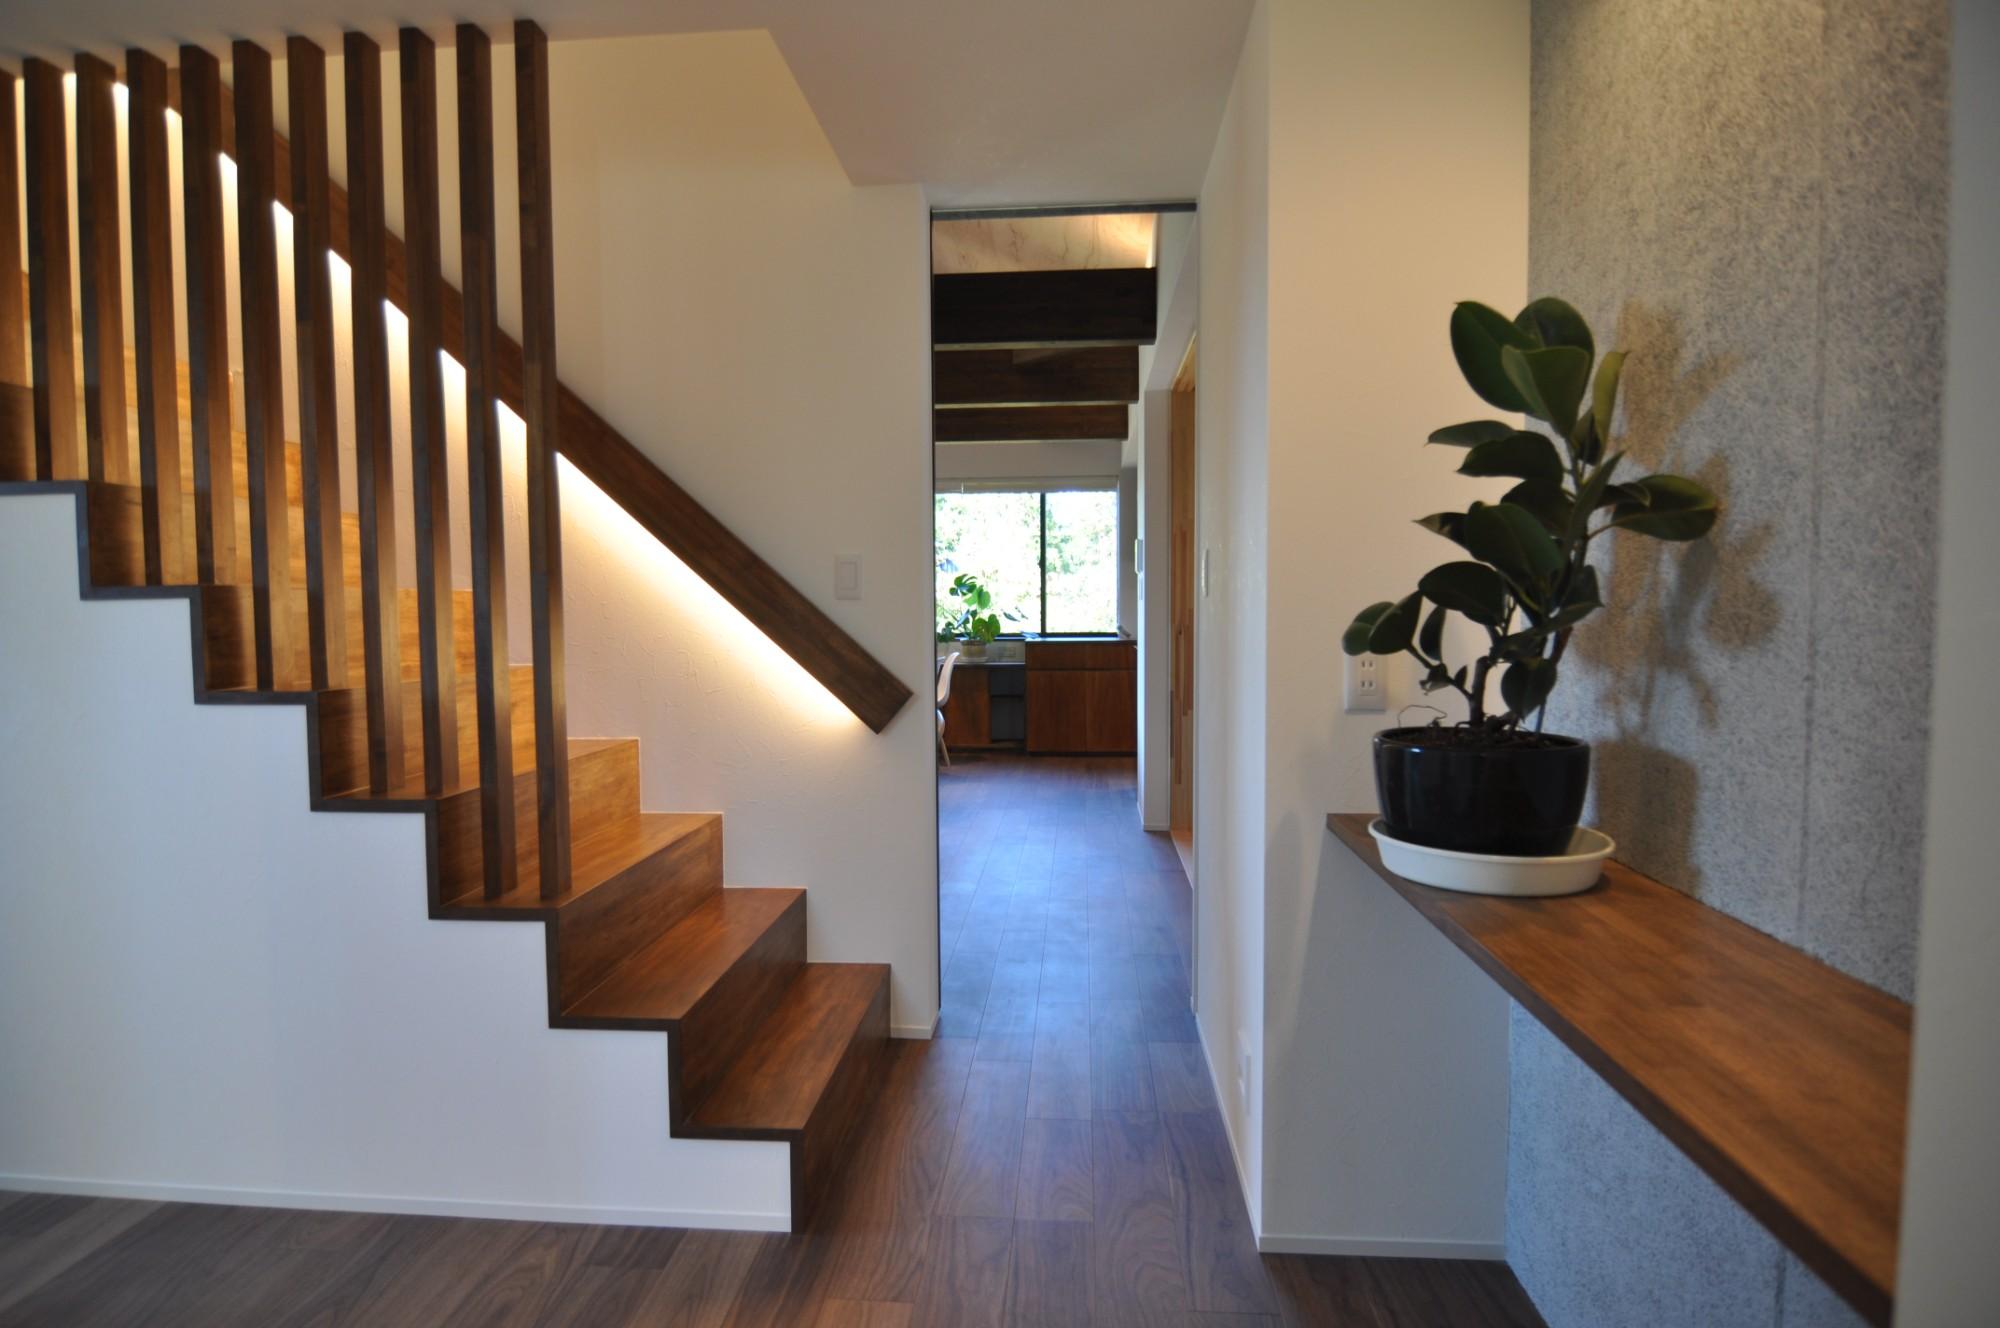 有限会社 市川建築店 1級建築士事務所「三条市 O様邸」のモダンな階段の実例写真